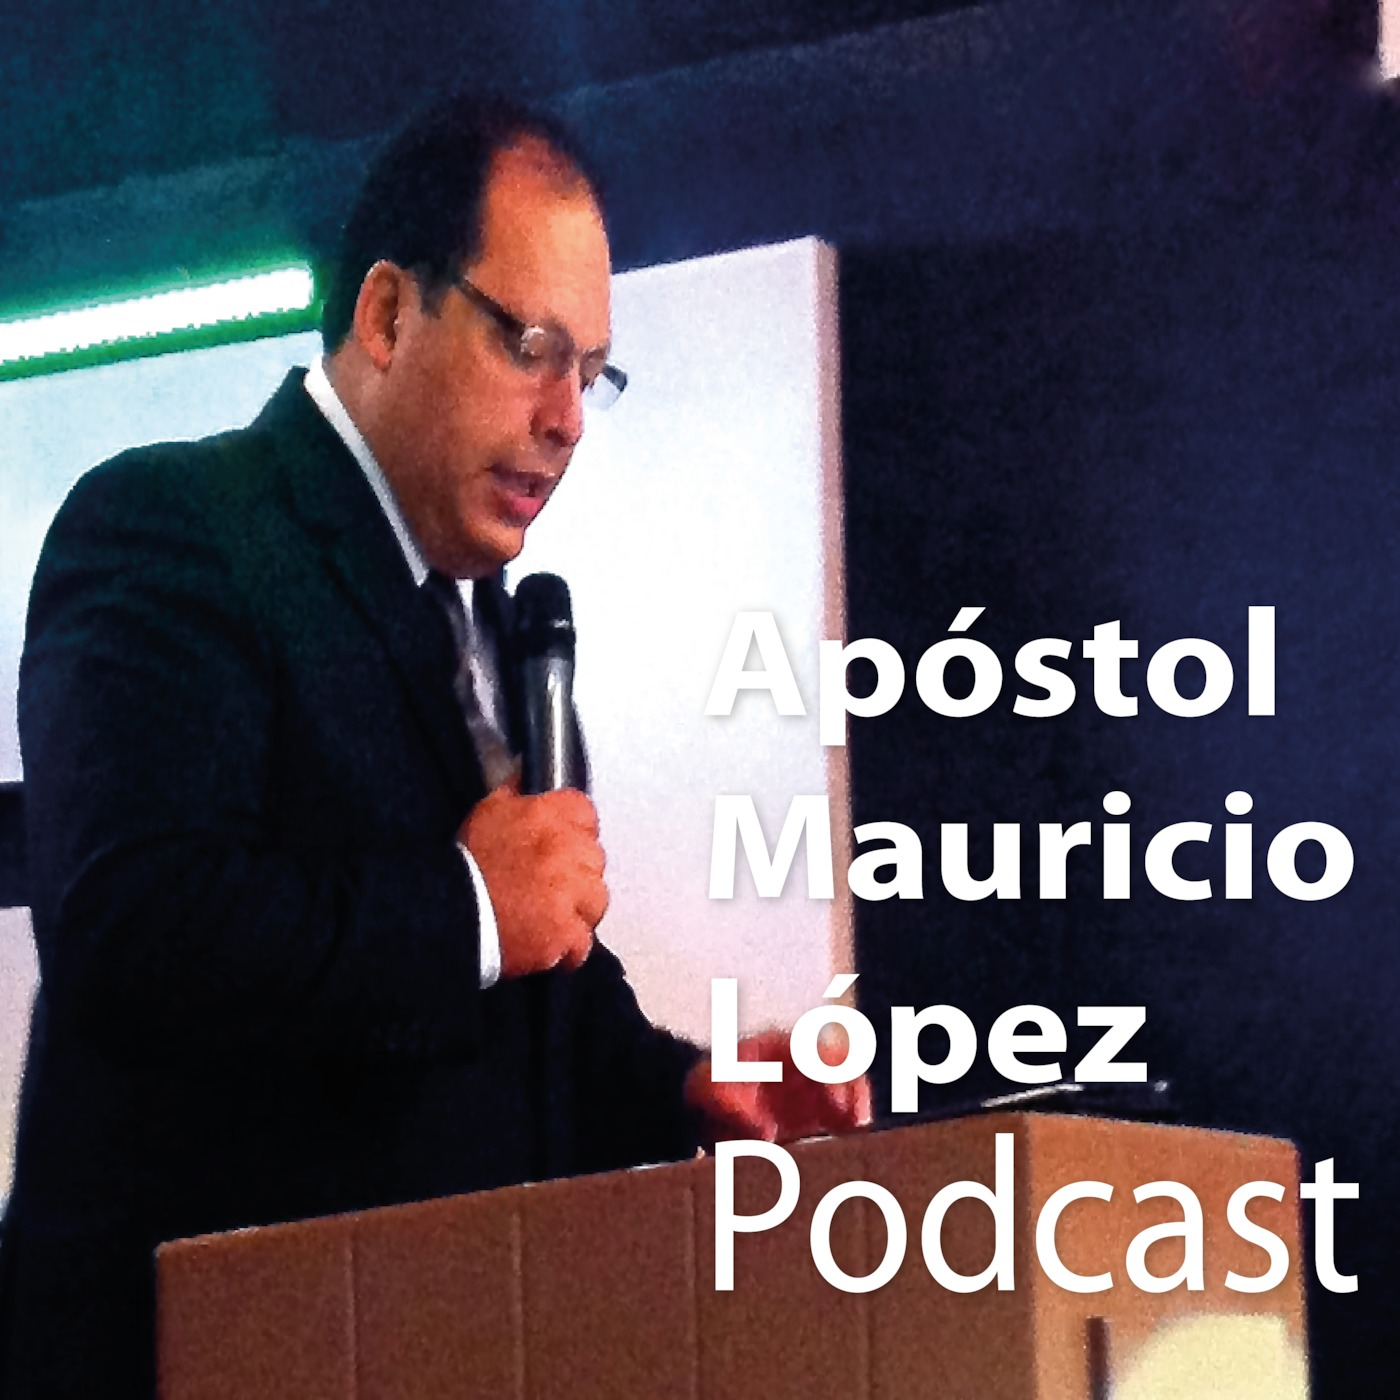 mauriciolopez7's Podcast